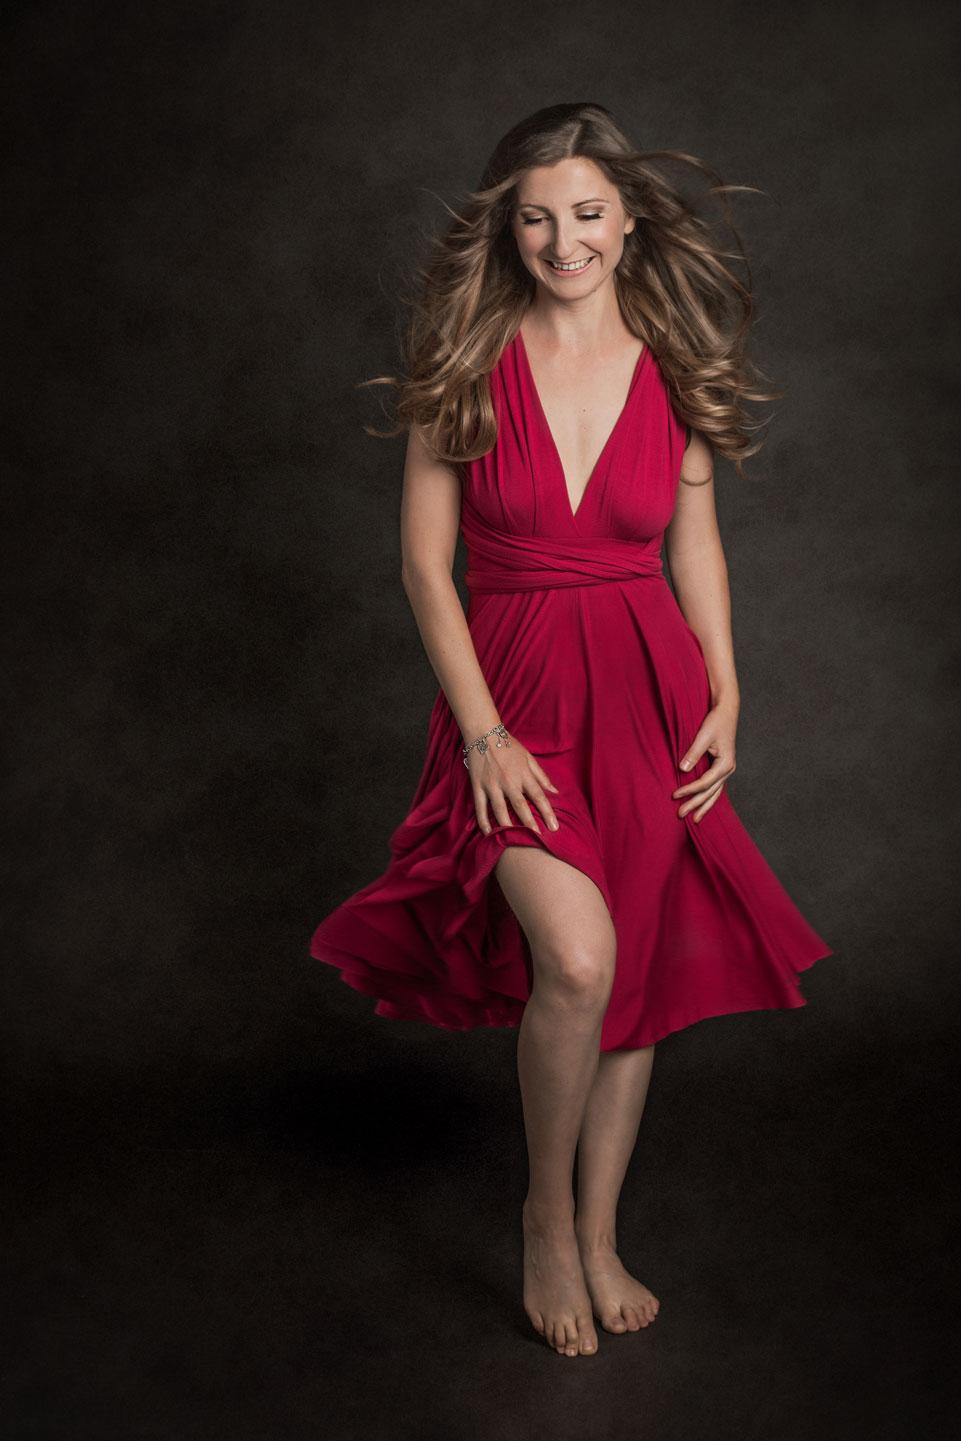 barbara_macferrin_photography_boulder_colorado_80303_fine_art_women_red_dress_long_hair.jpg